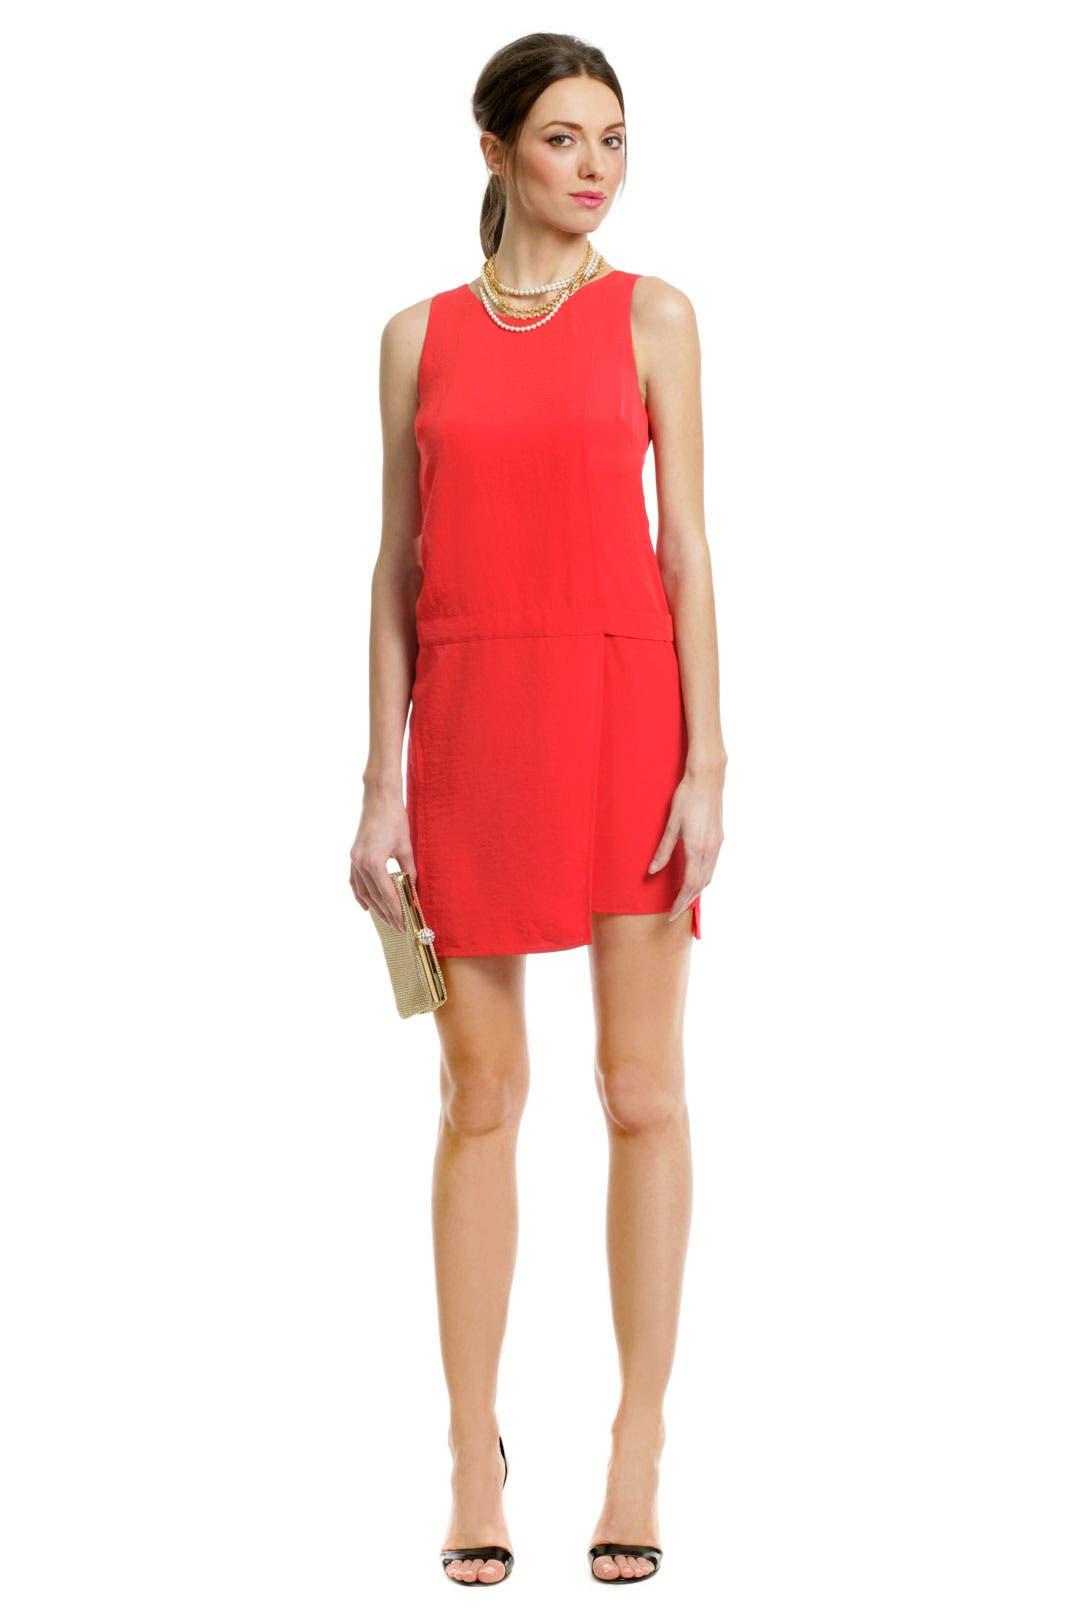 Primary Contrast Zip Dress by Sachin & Babi